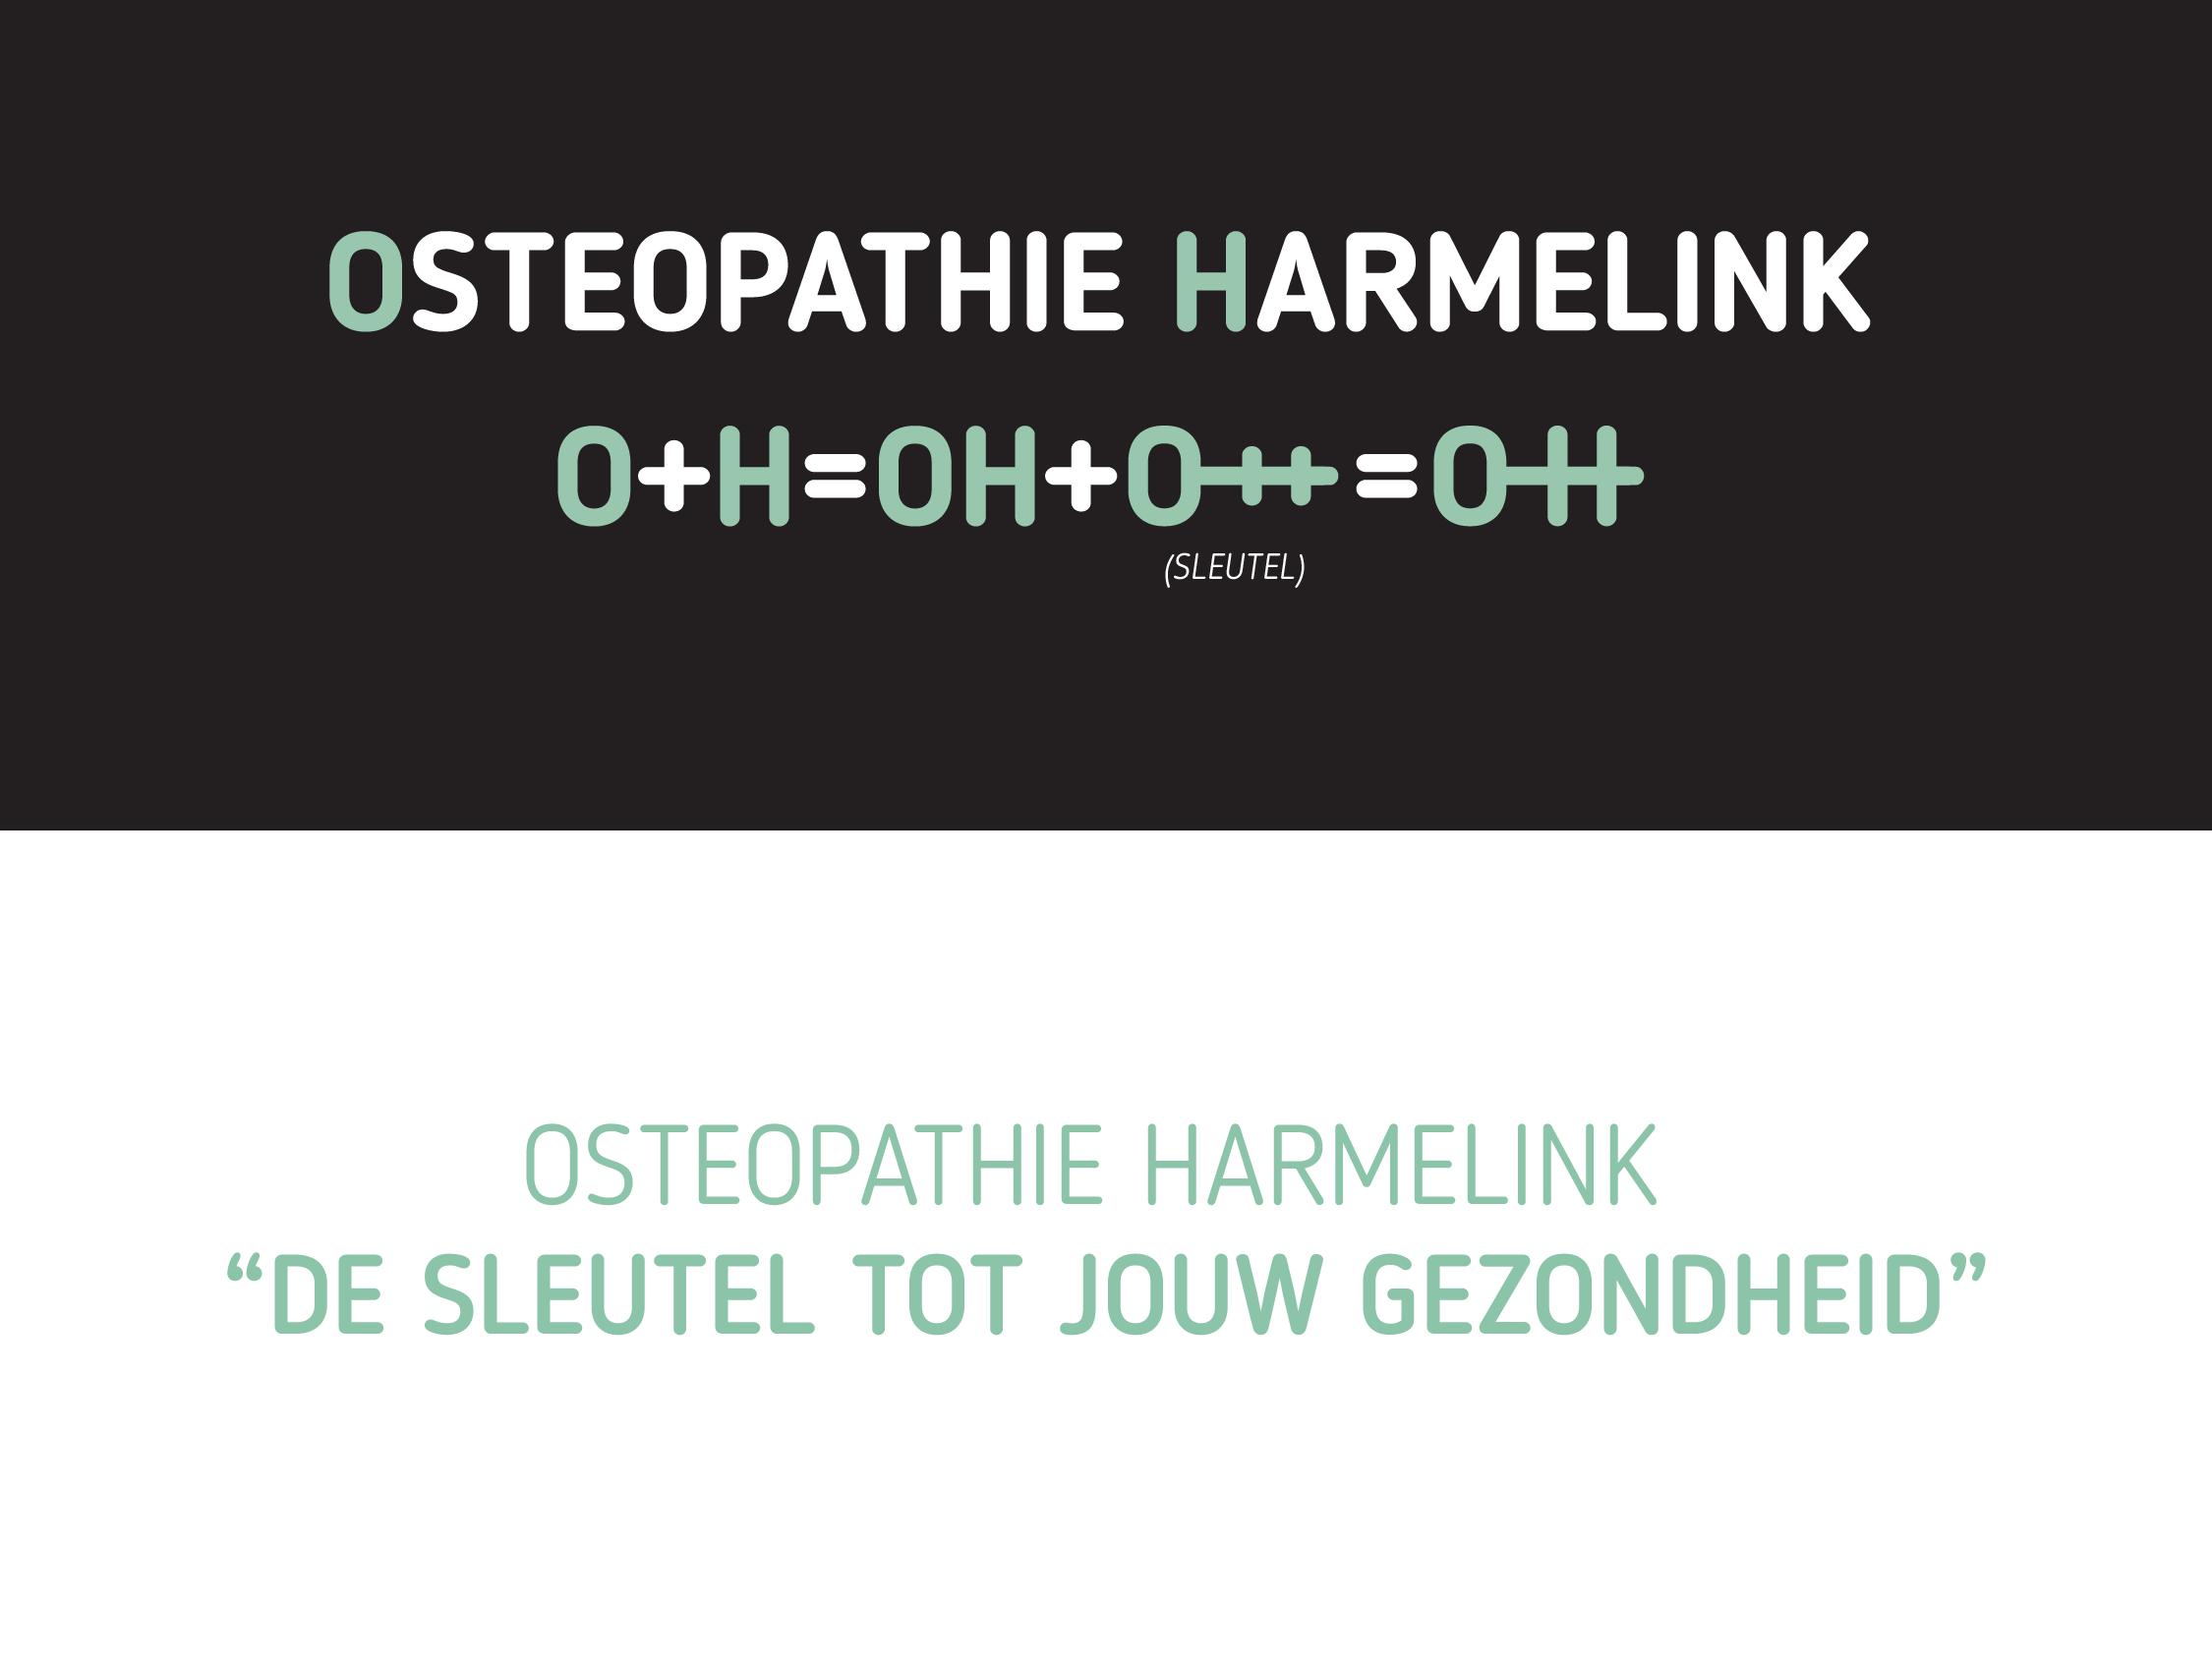 Osteopathie_Harmelink_XAdesign_Xander_Abbink_Logo_huisstijl-gedachte-concept-sleutel